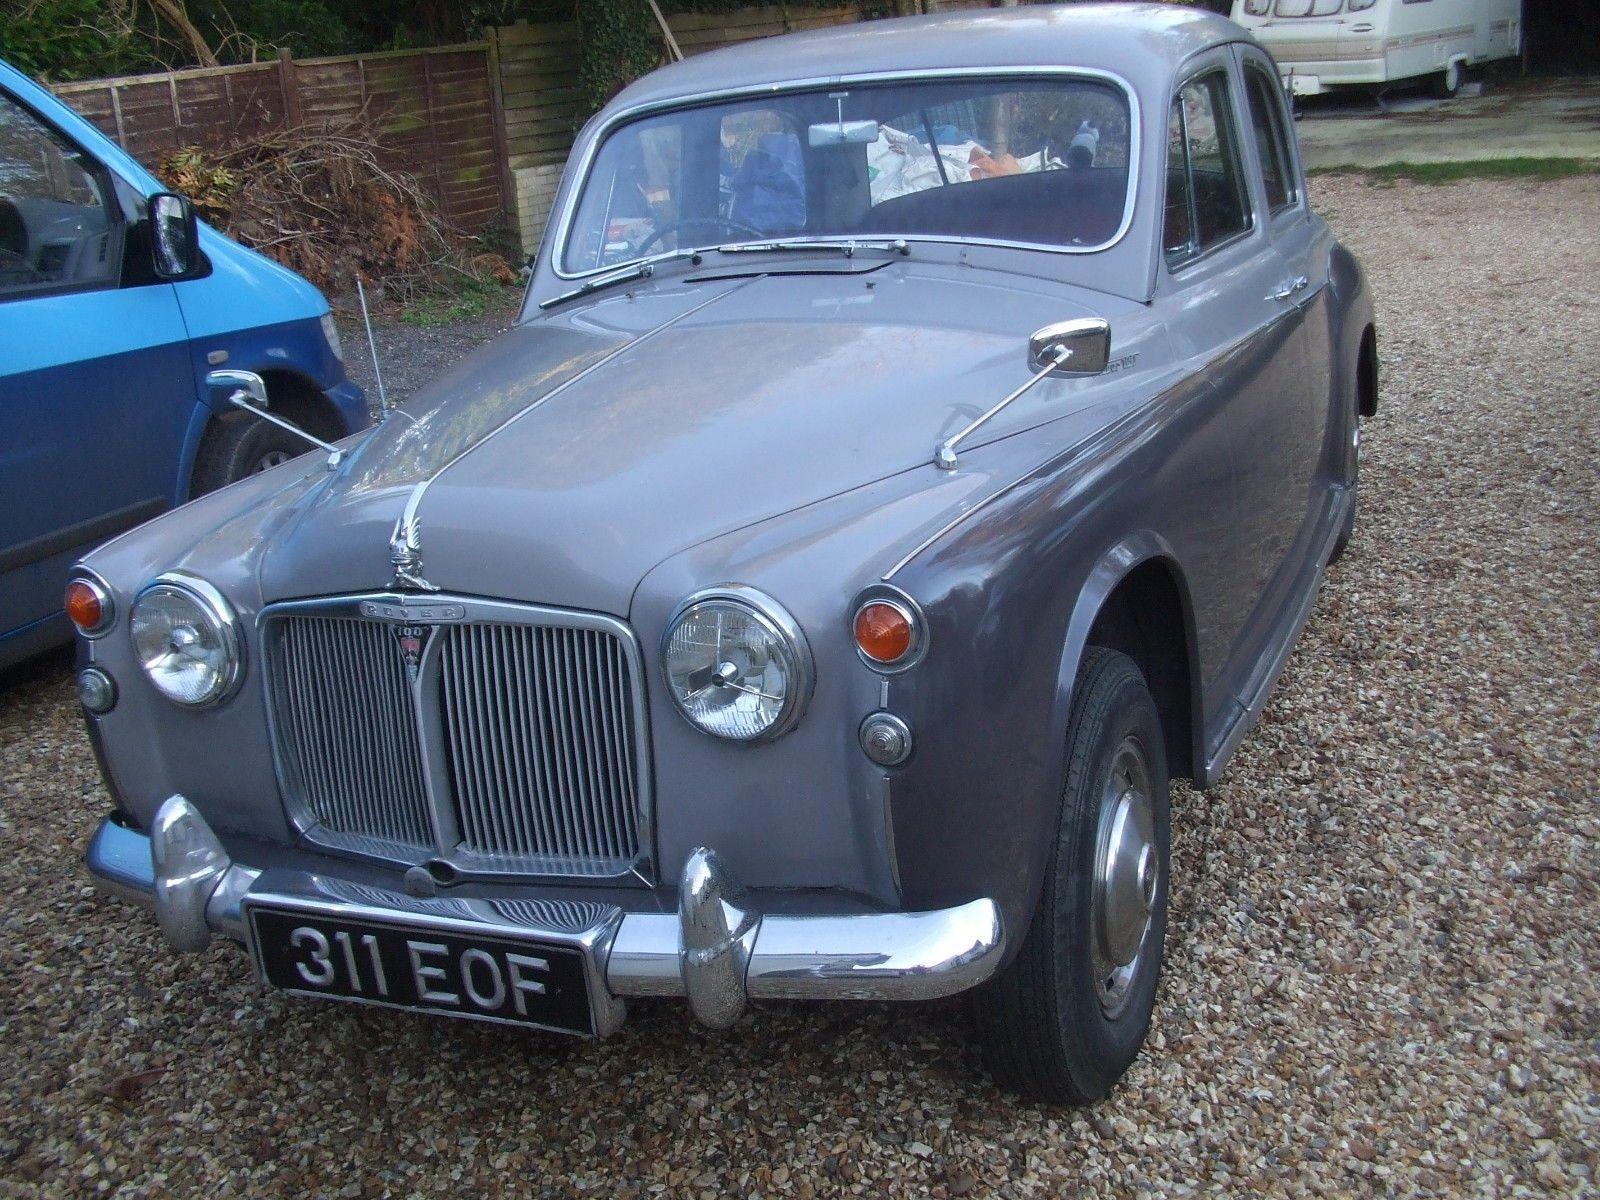 eBay: Rover P4 100. 1961. MOT. Good original condition. Transferable ...